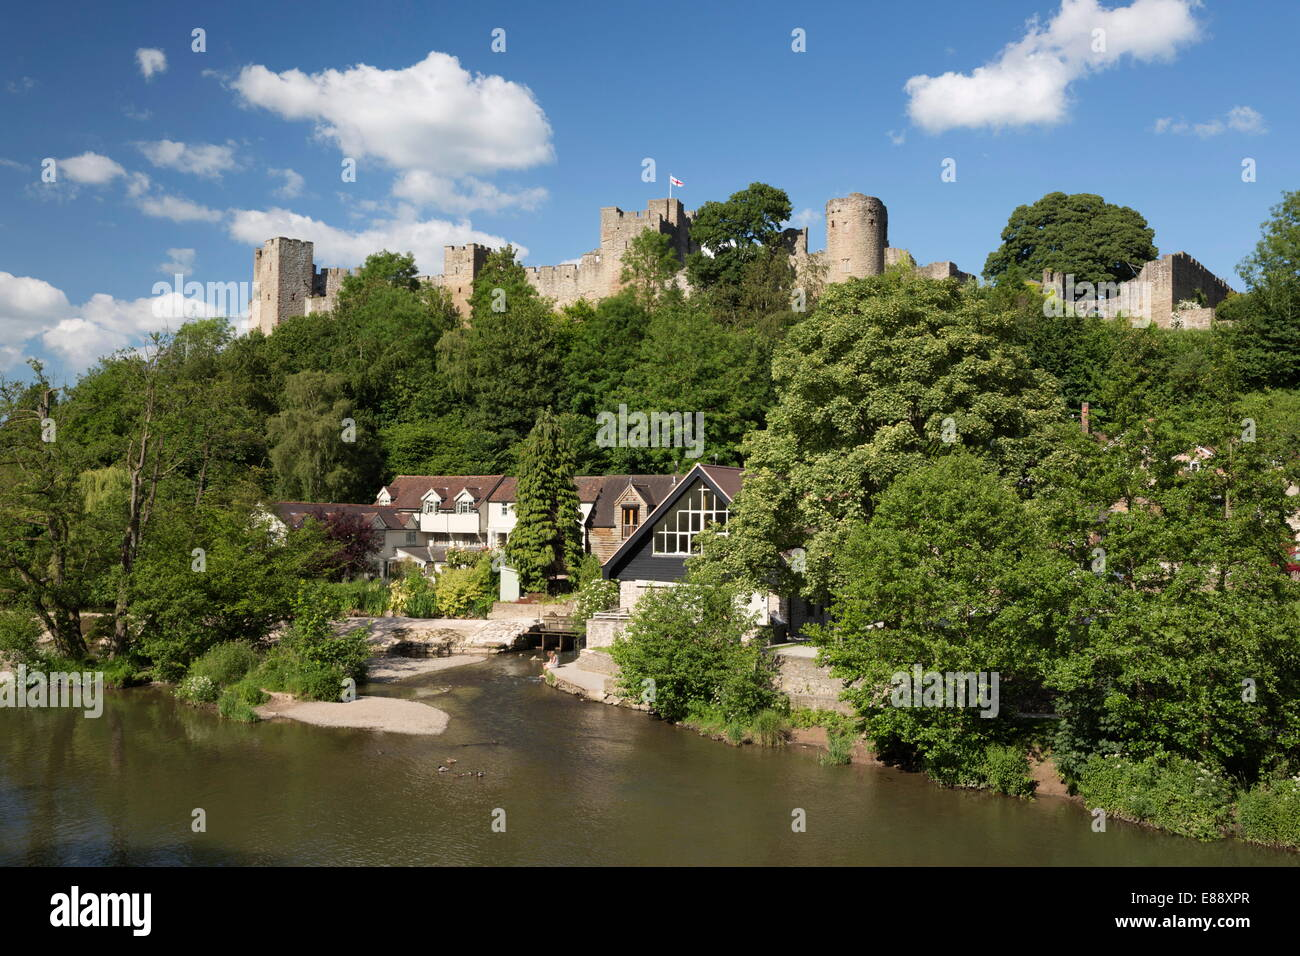 Ludlow Castle above the River Teme, Ludlow, Shropshire, England, United Kingdom, Europe - Stock Image